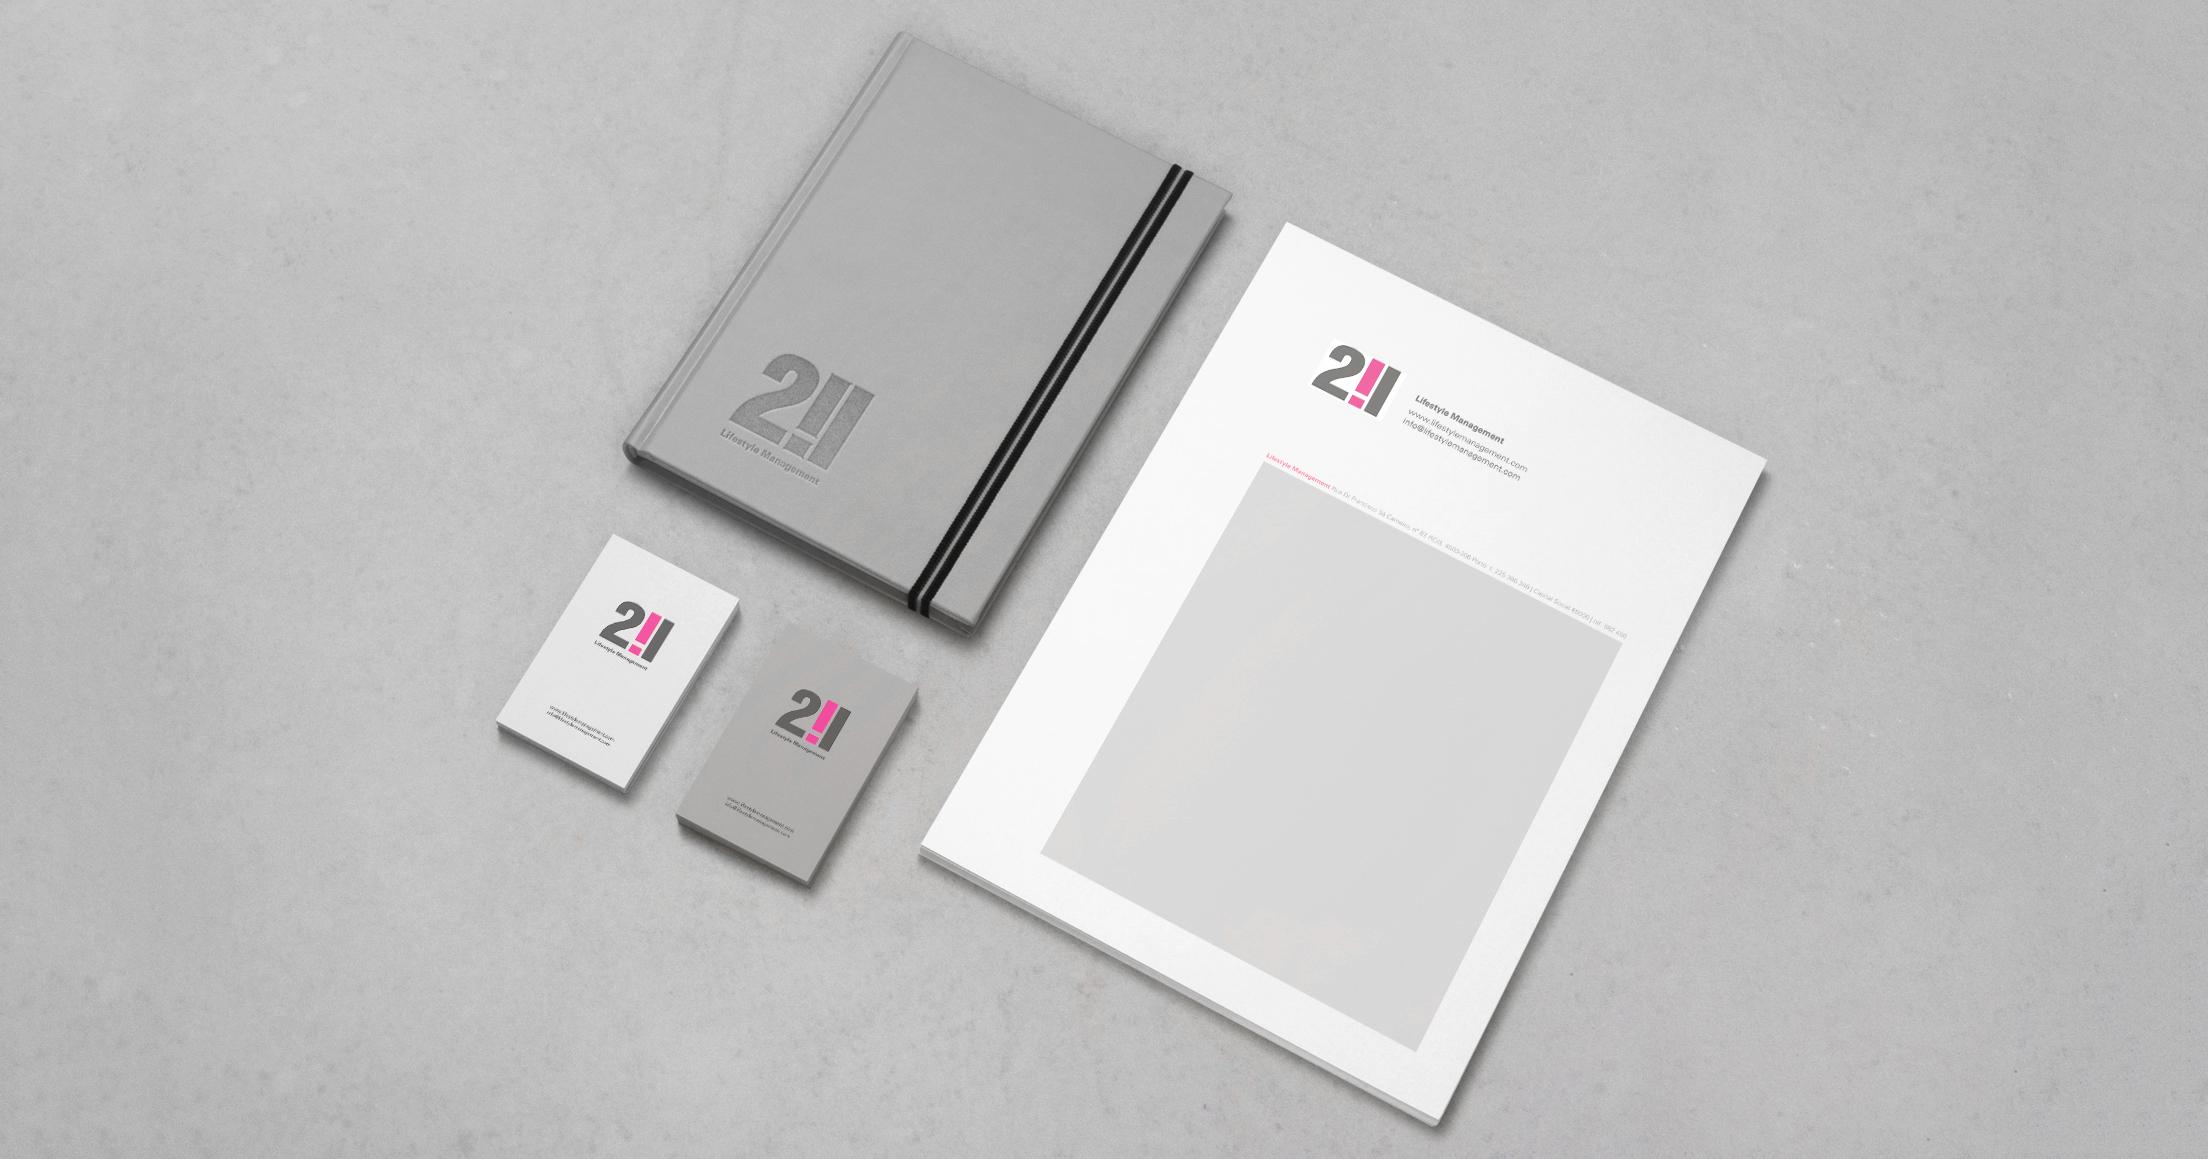 Design-Grafico-Graphic-Design-Logotipo-Logo-Identidade-Branding-Economato-Stationary-Lifestyle-Management-bonjourmolotov.jpg